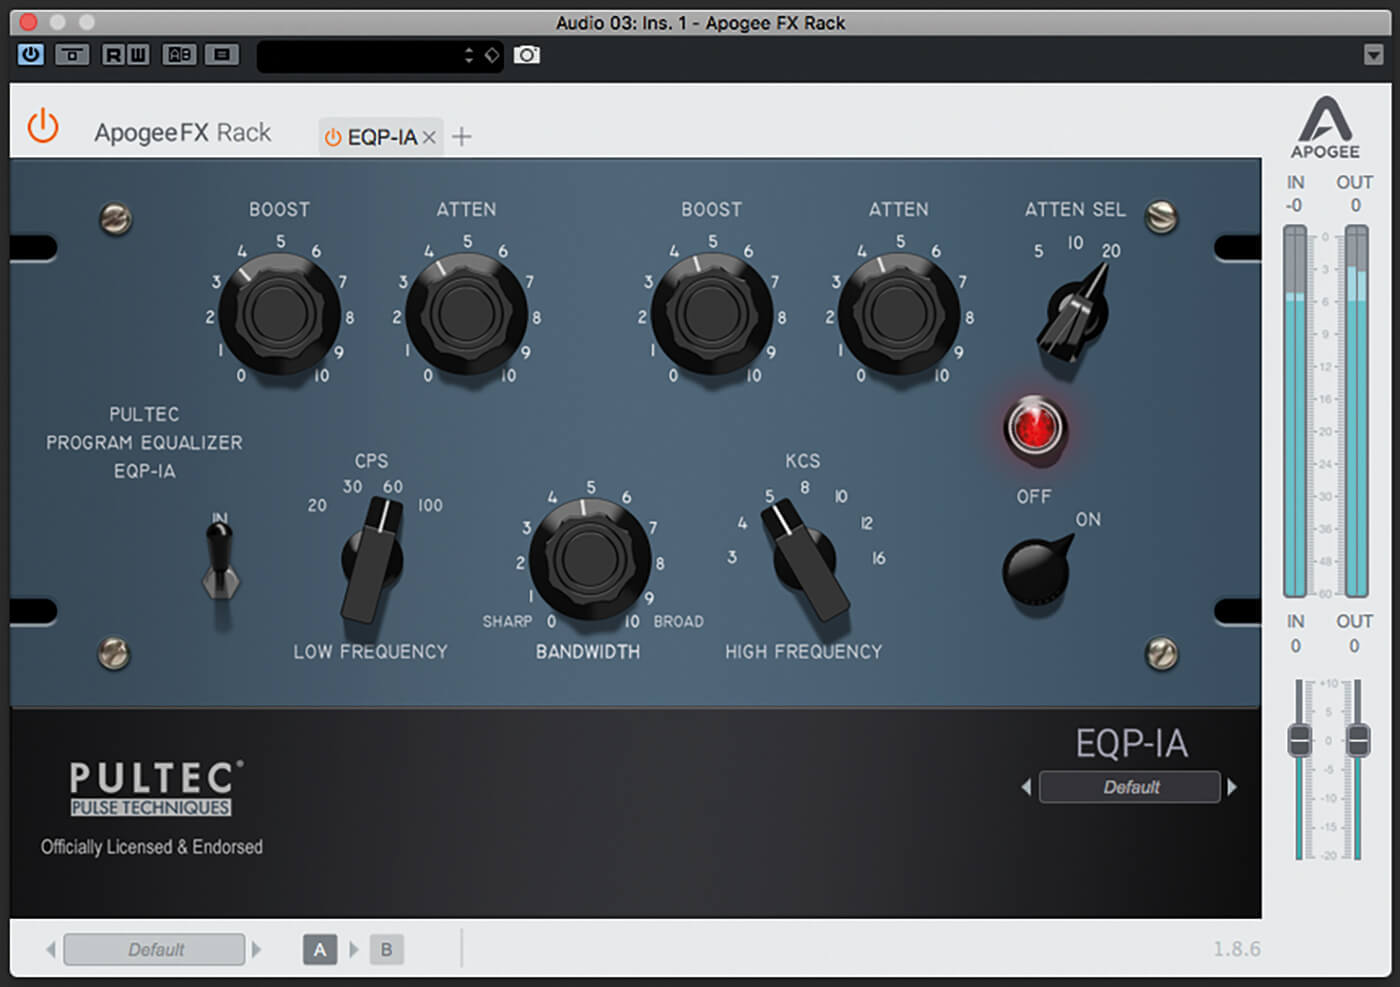 Apogee FX Rack  Pultec EQP-1A